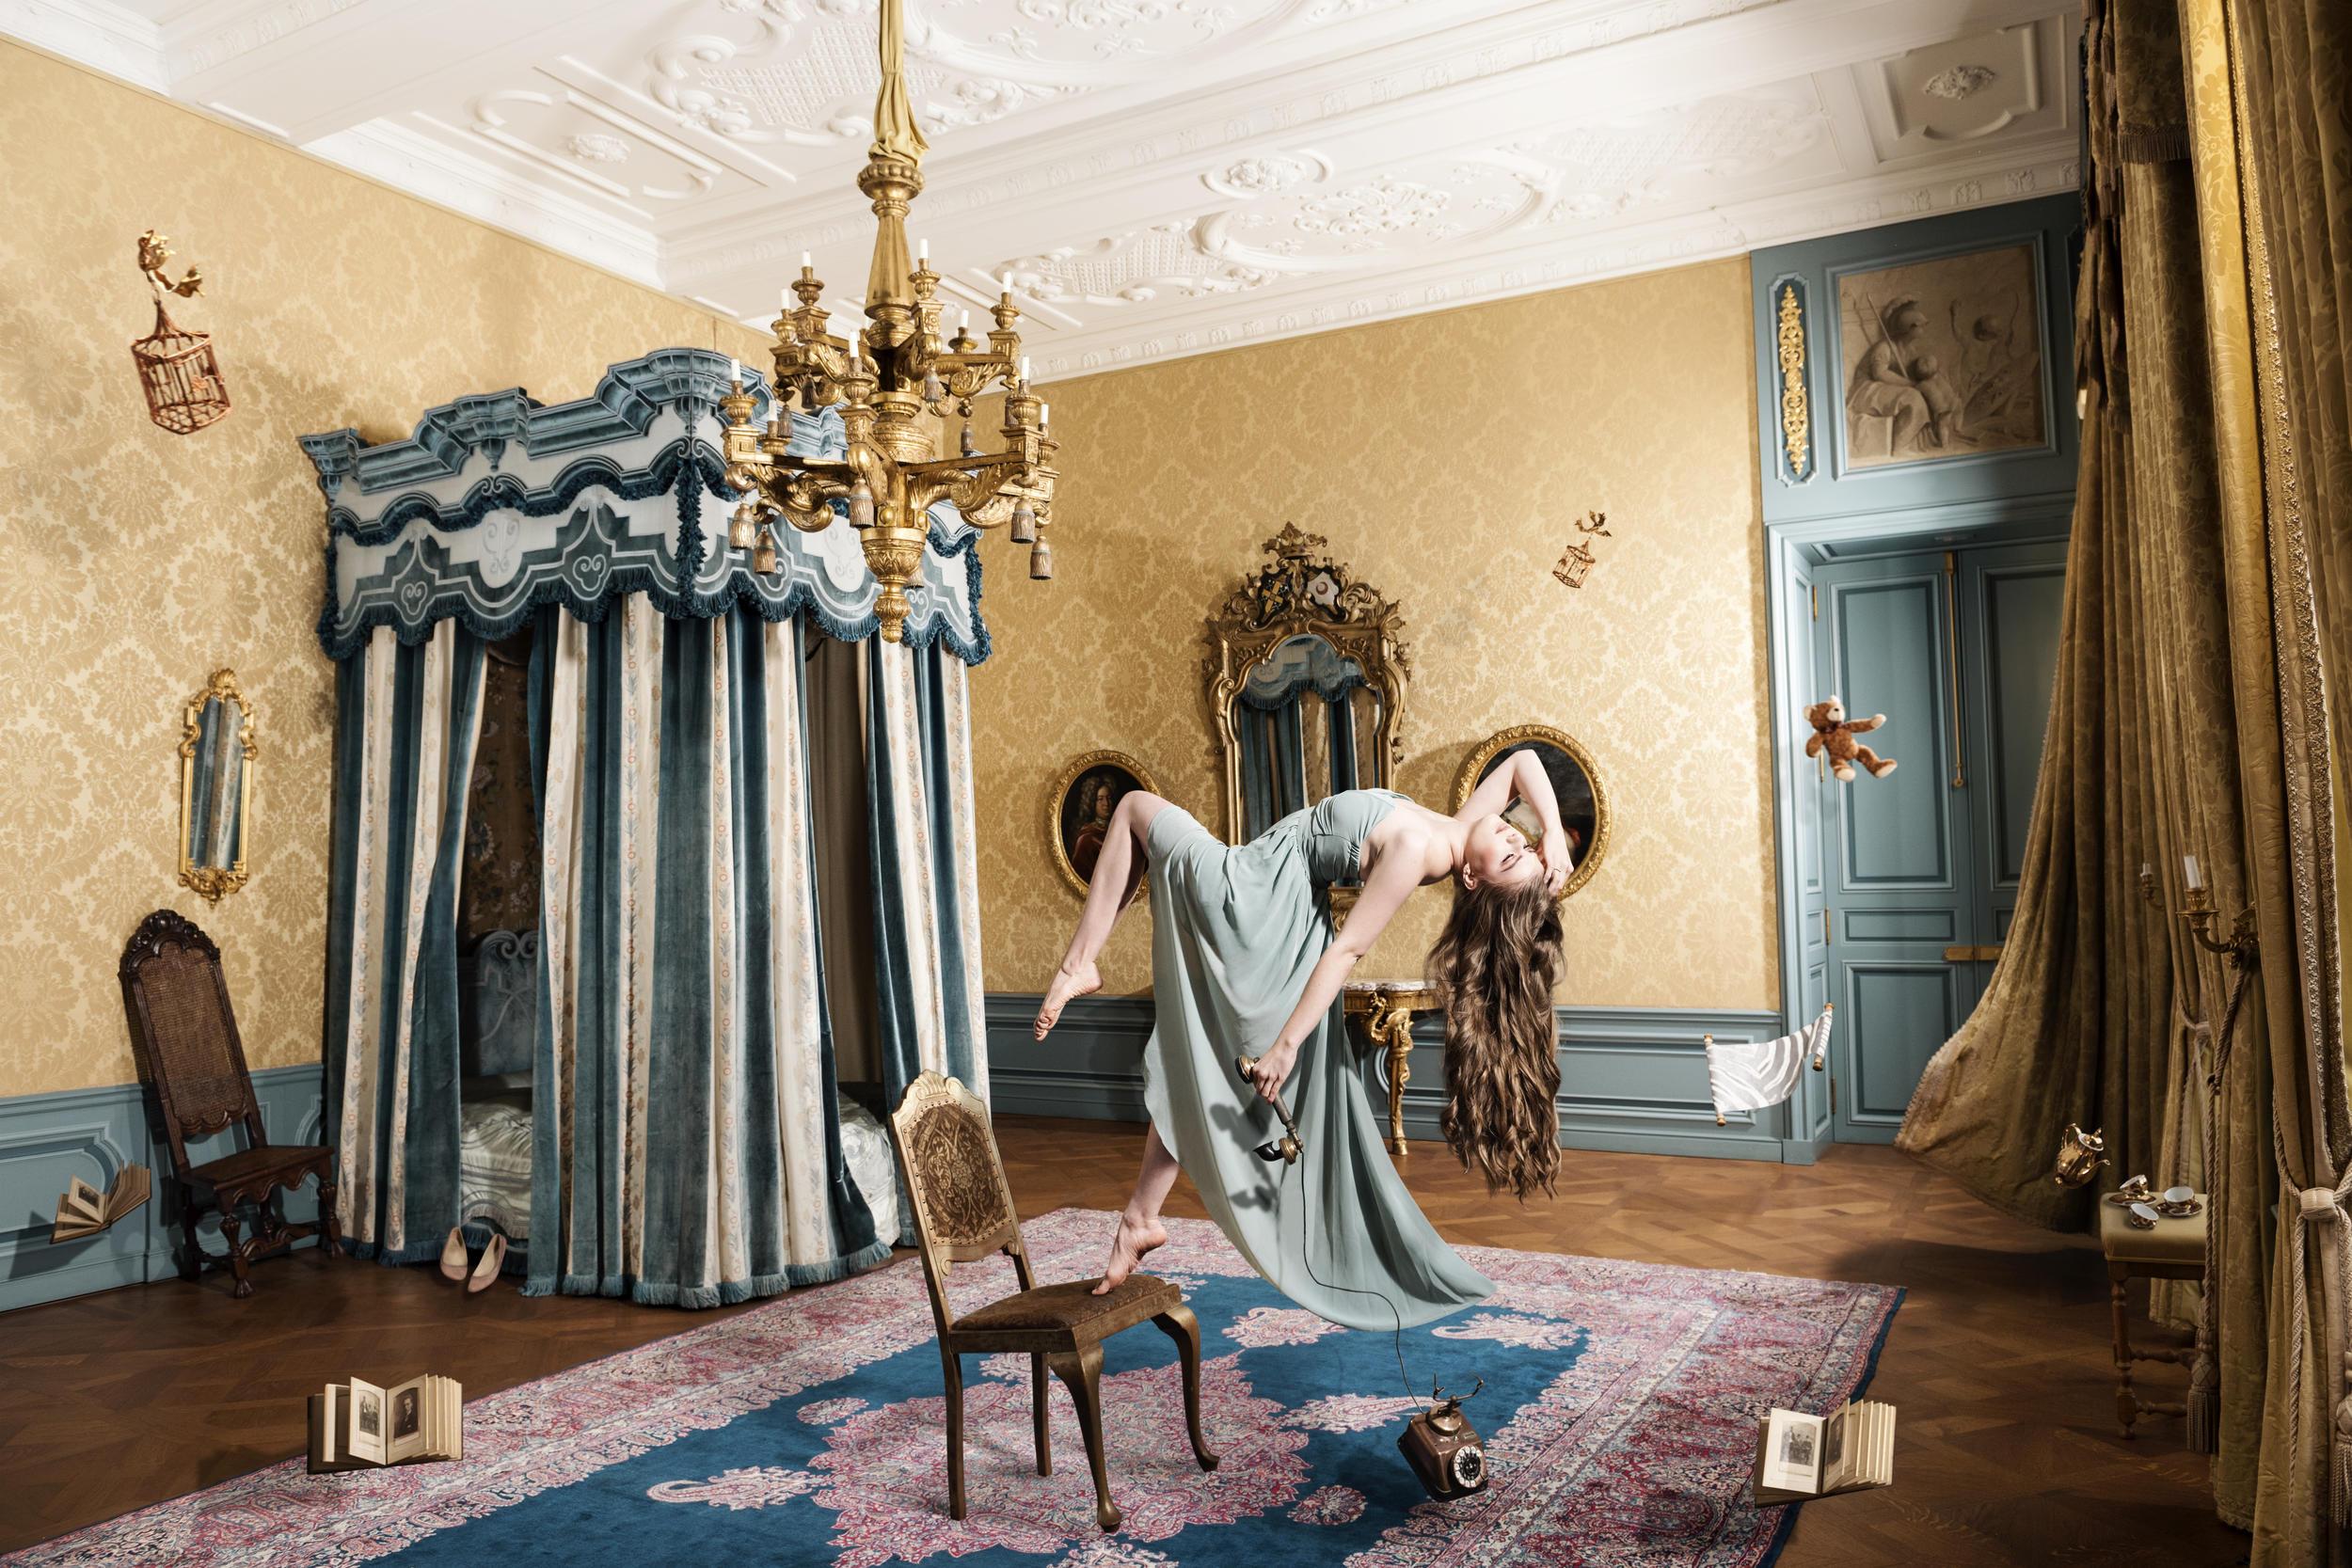 Stijlkamer kunstproject fotoshoot